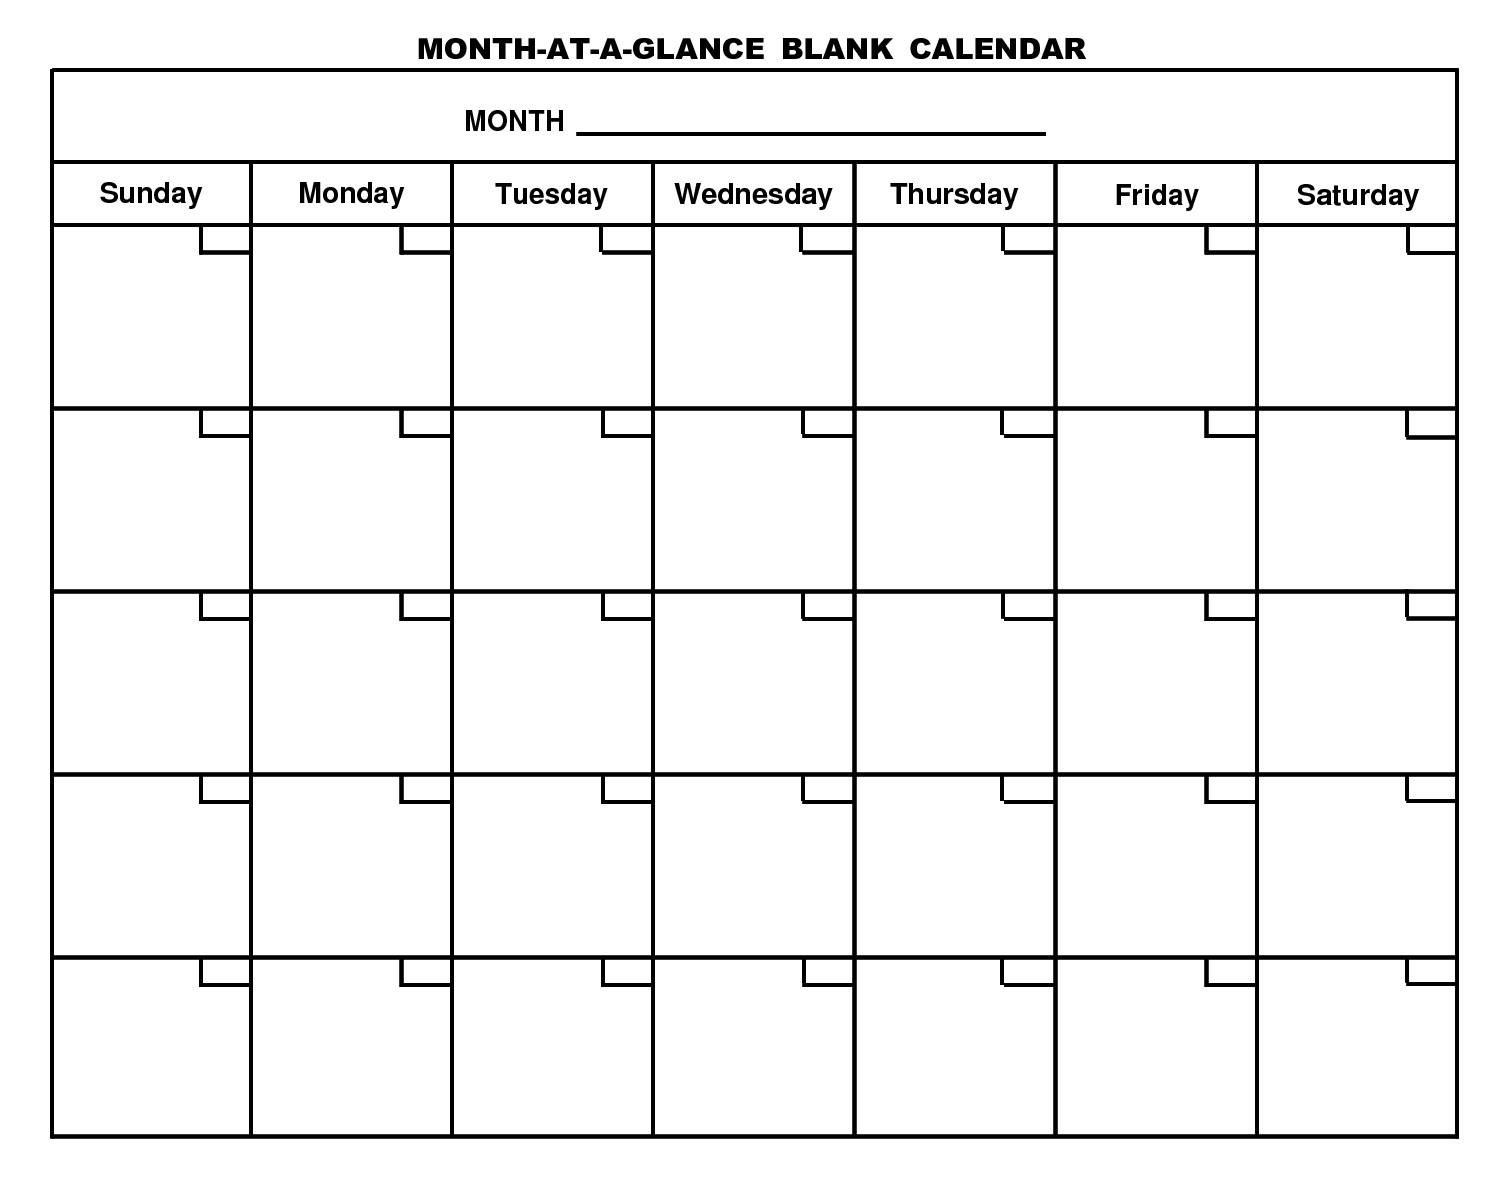 Calendar Template To Print Print Blank Calendar Template-Build A Saturday To Friday Monthly Calendar